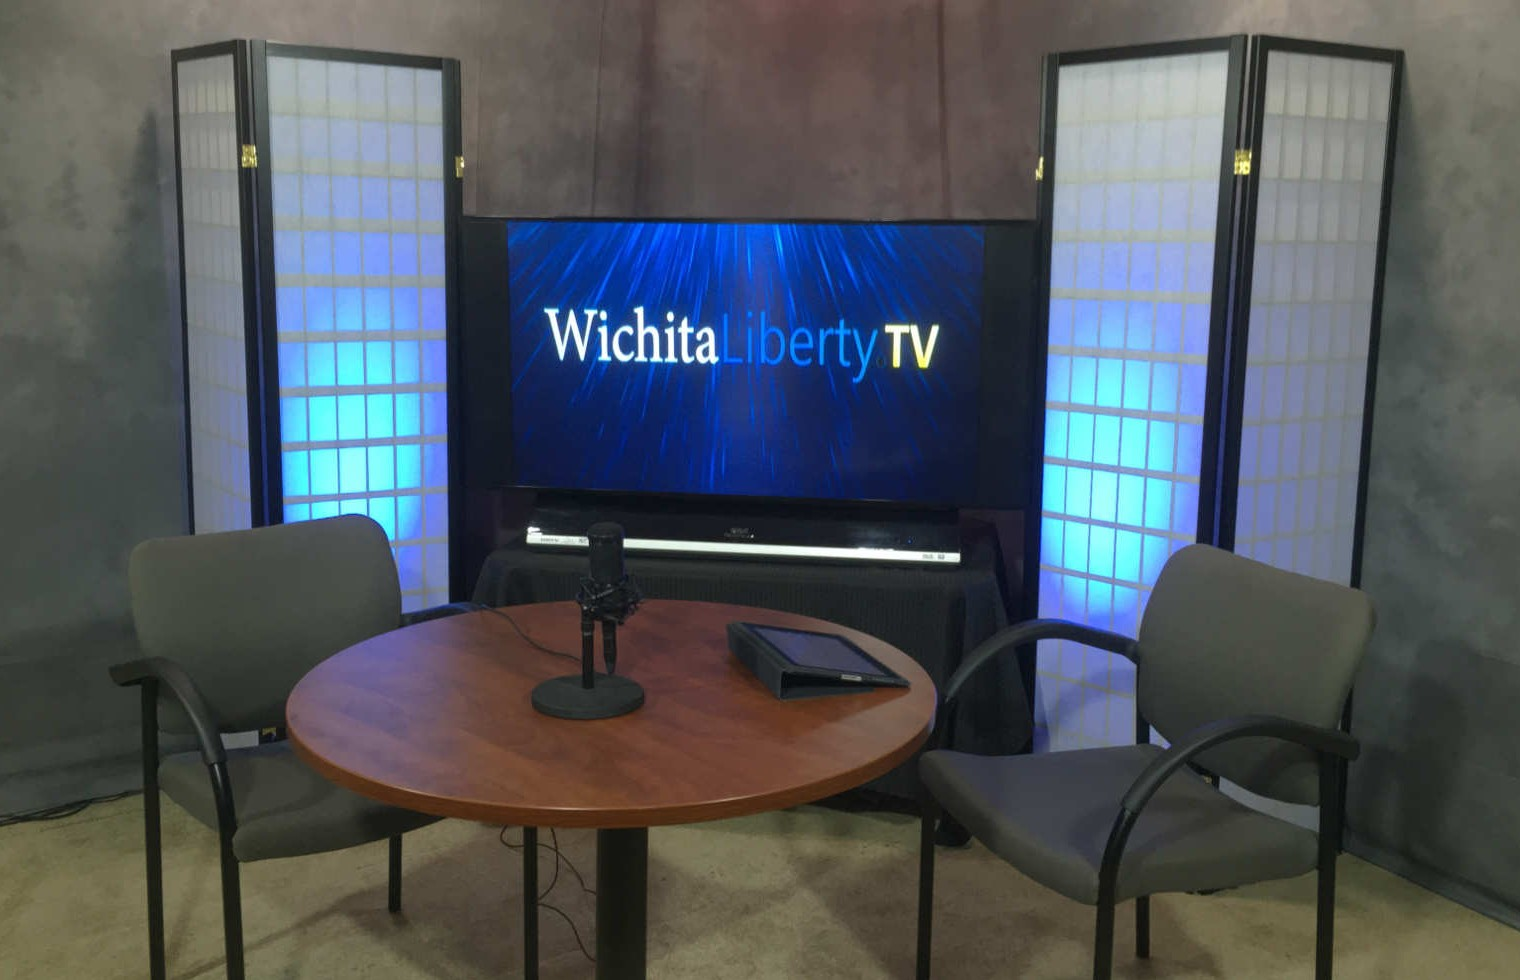 WichitaLiberty.TV: Wichita's attitude towards empowering citizens, tax credits, and school choice